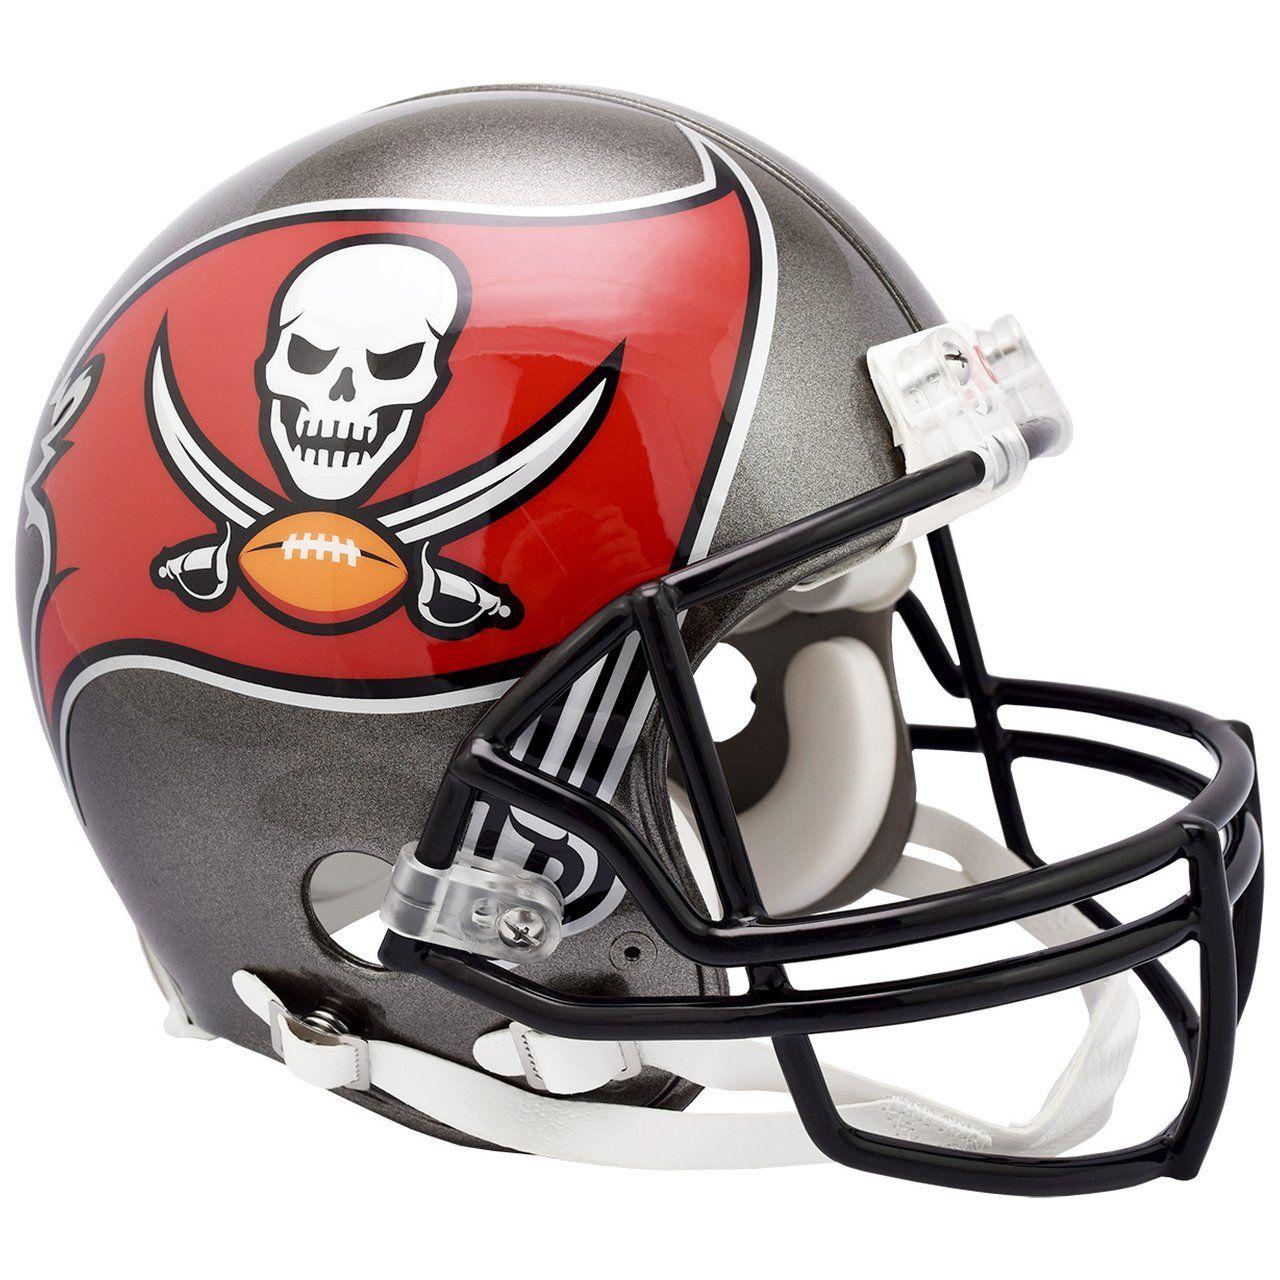 amfoo - Riddell VSR4 Authentic Football Helm - Tampa Bay Buccaneers